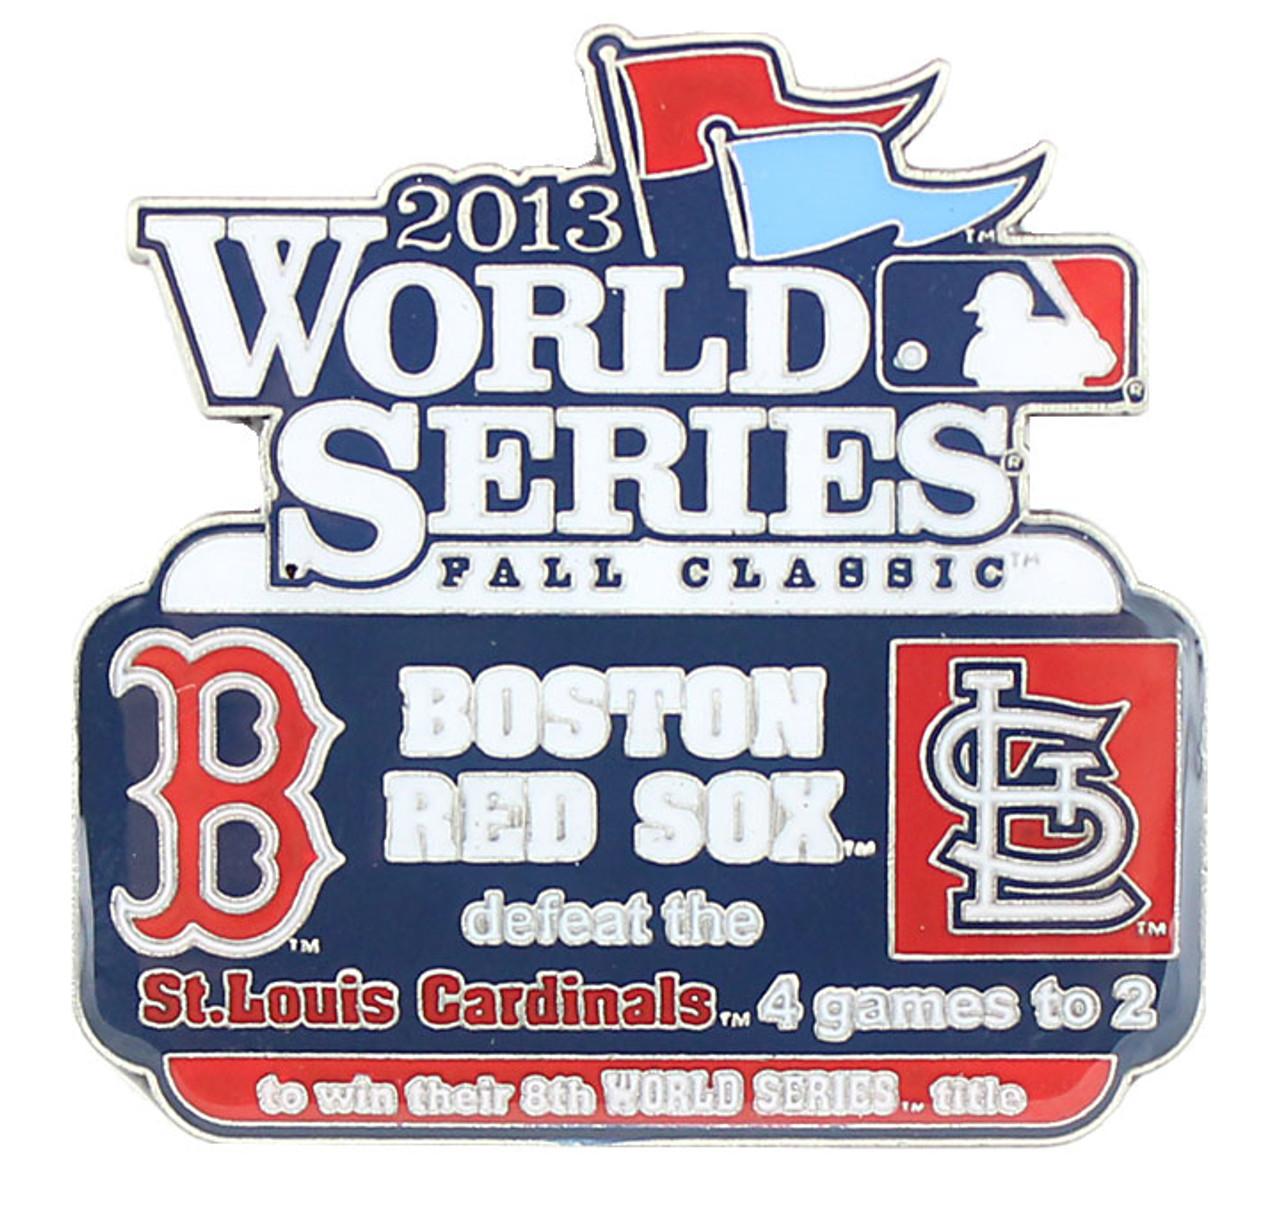 2013 World Series Commemorative Pin - Red Sox vs  Cardinals